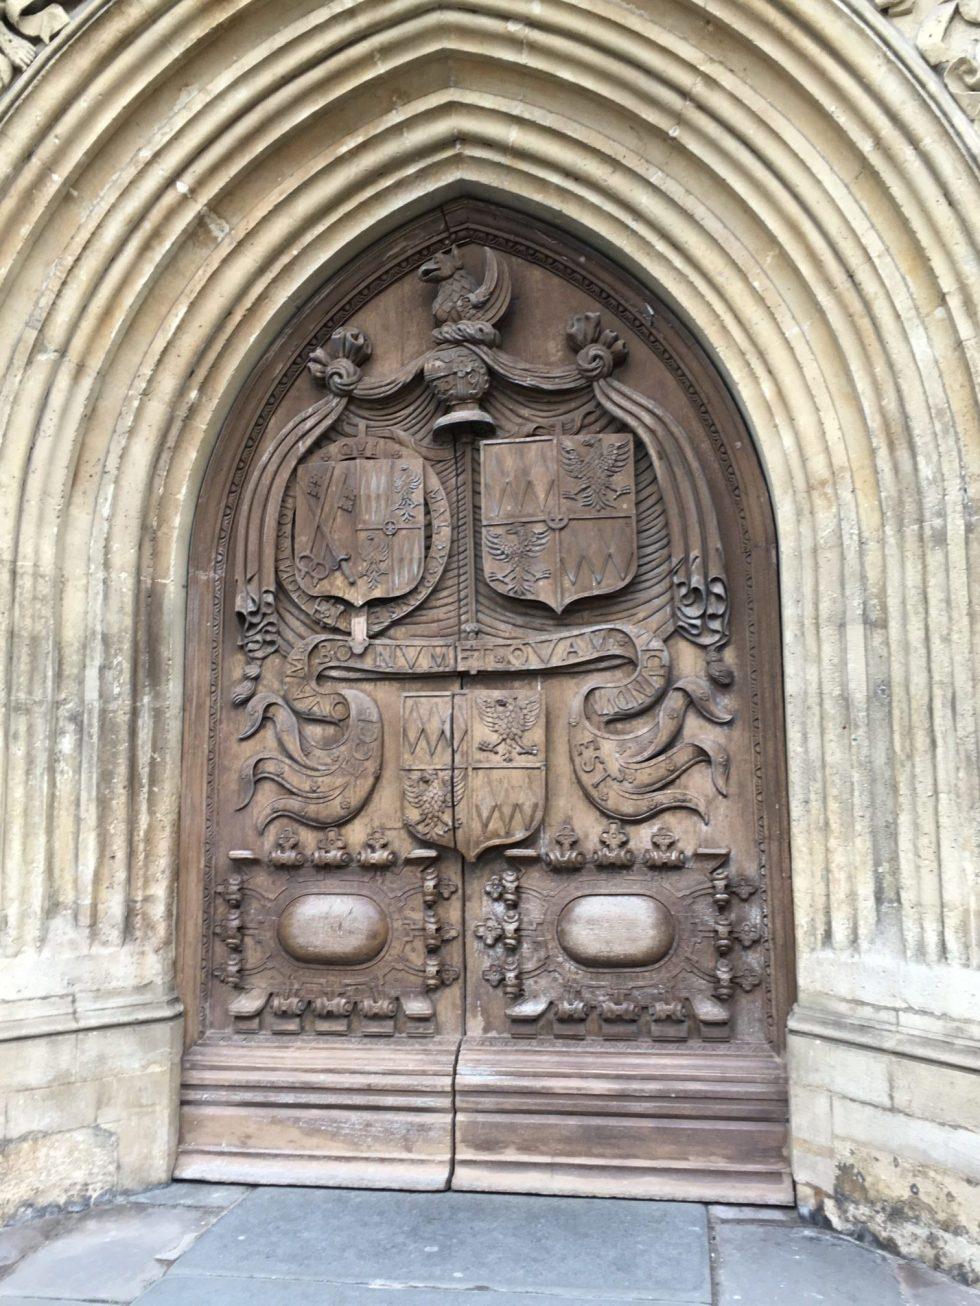 Doors to the house of the dead, Bath, England